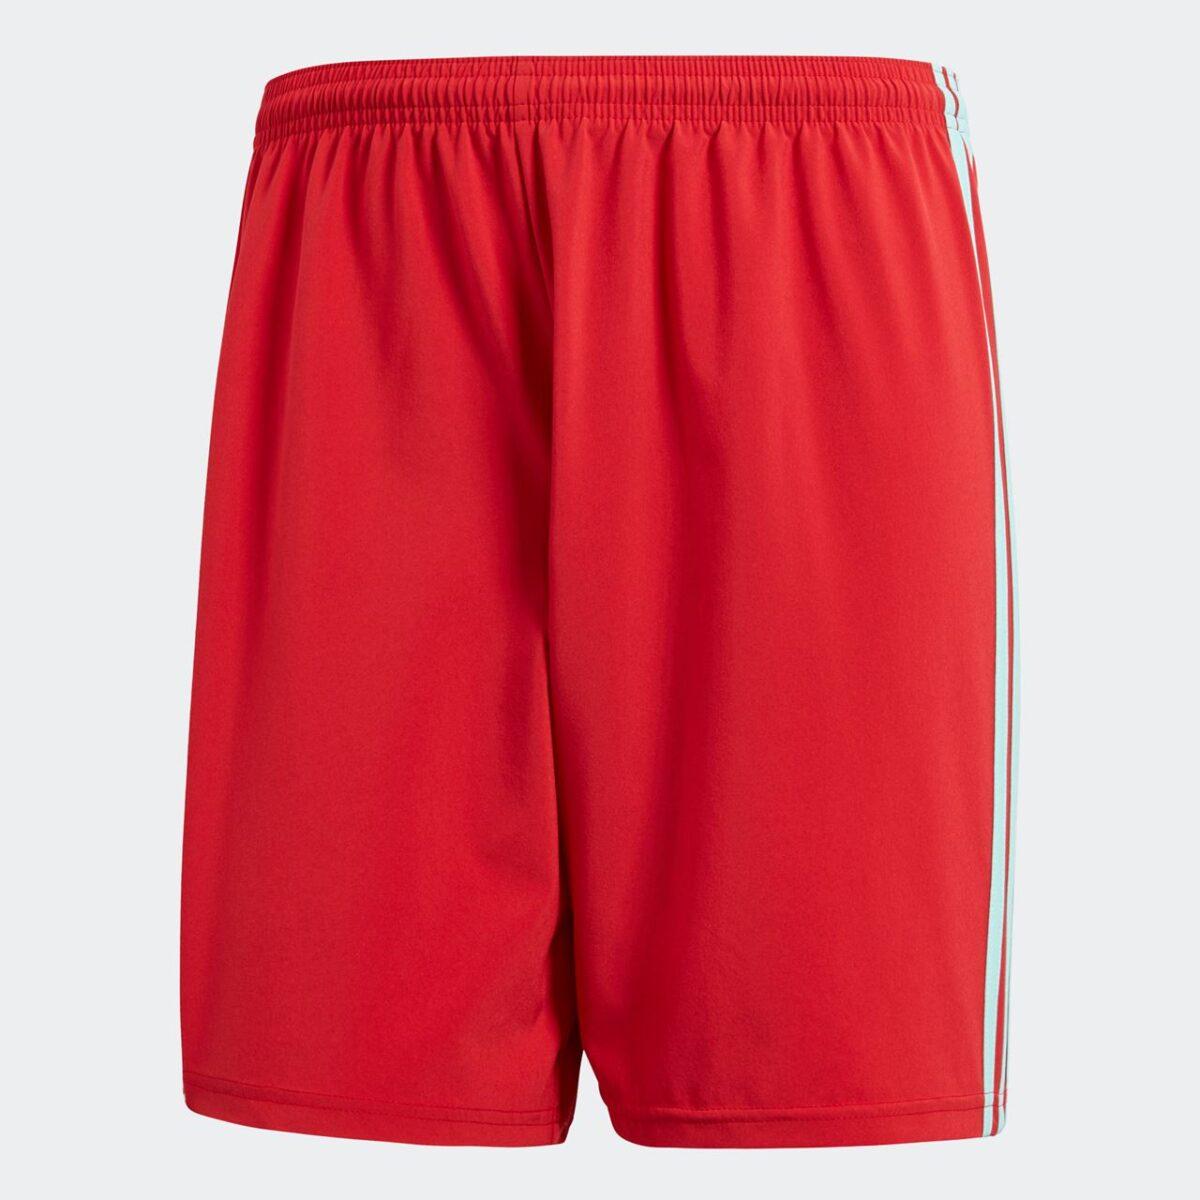 Adidas Condivo 18 GK Shorts Adult